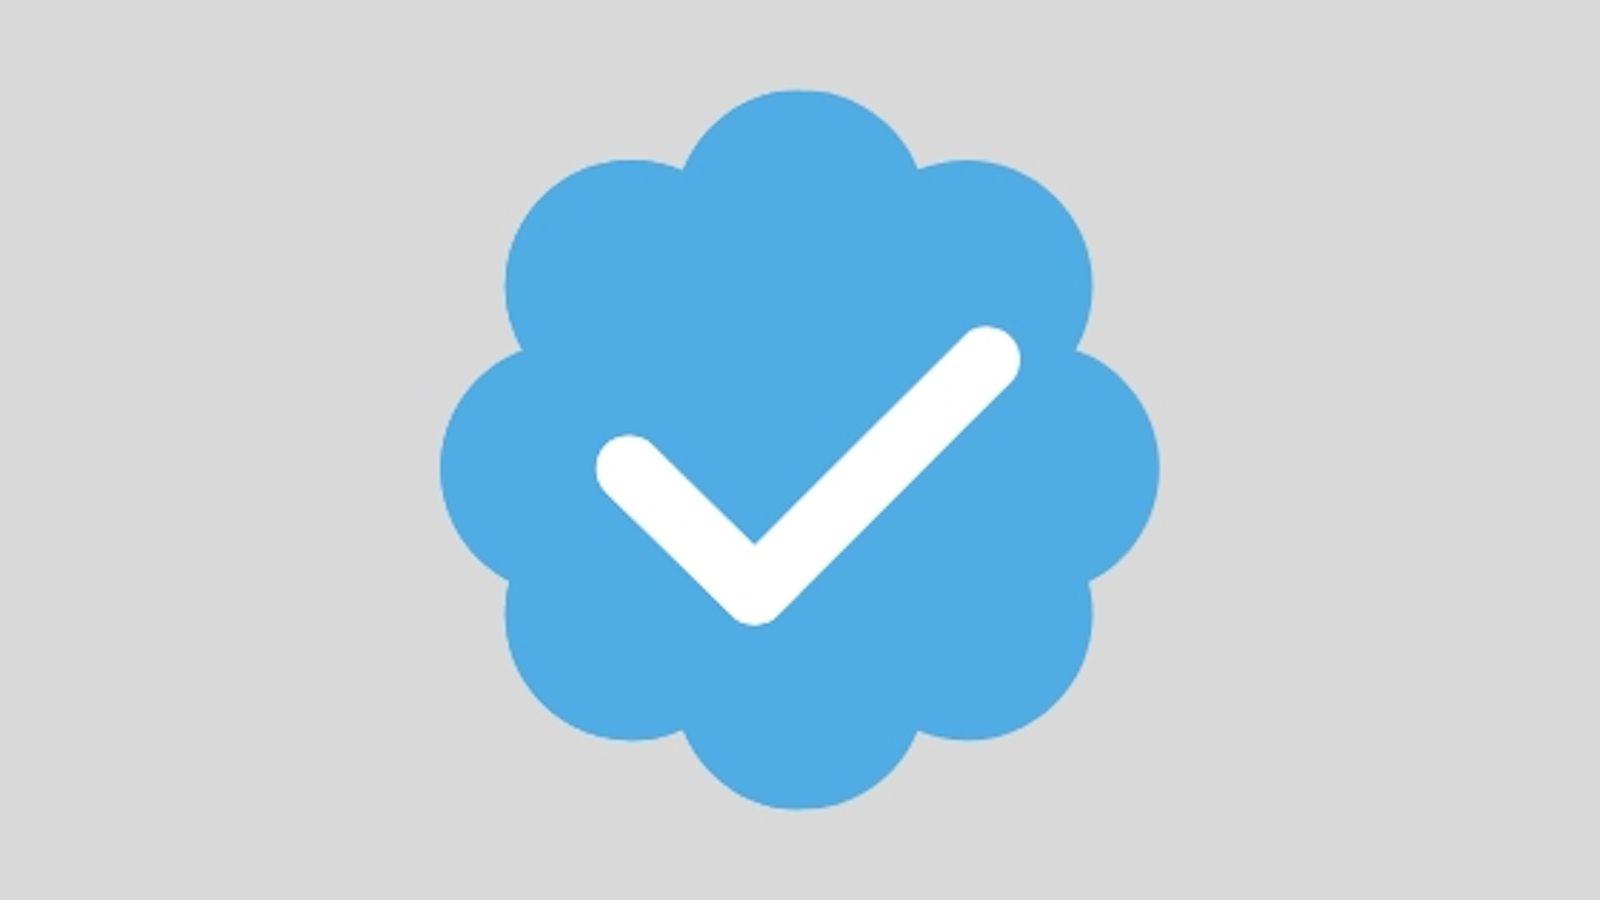 Twitter's blue verification checkmark icon